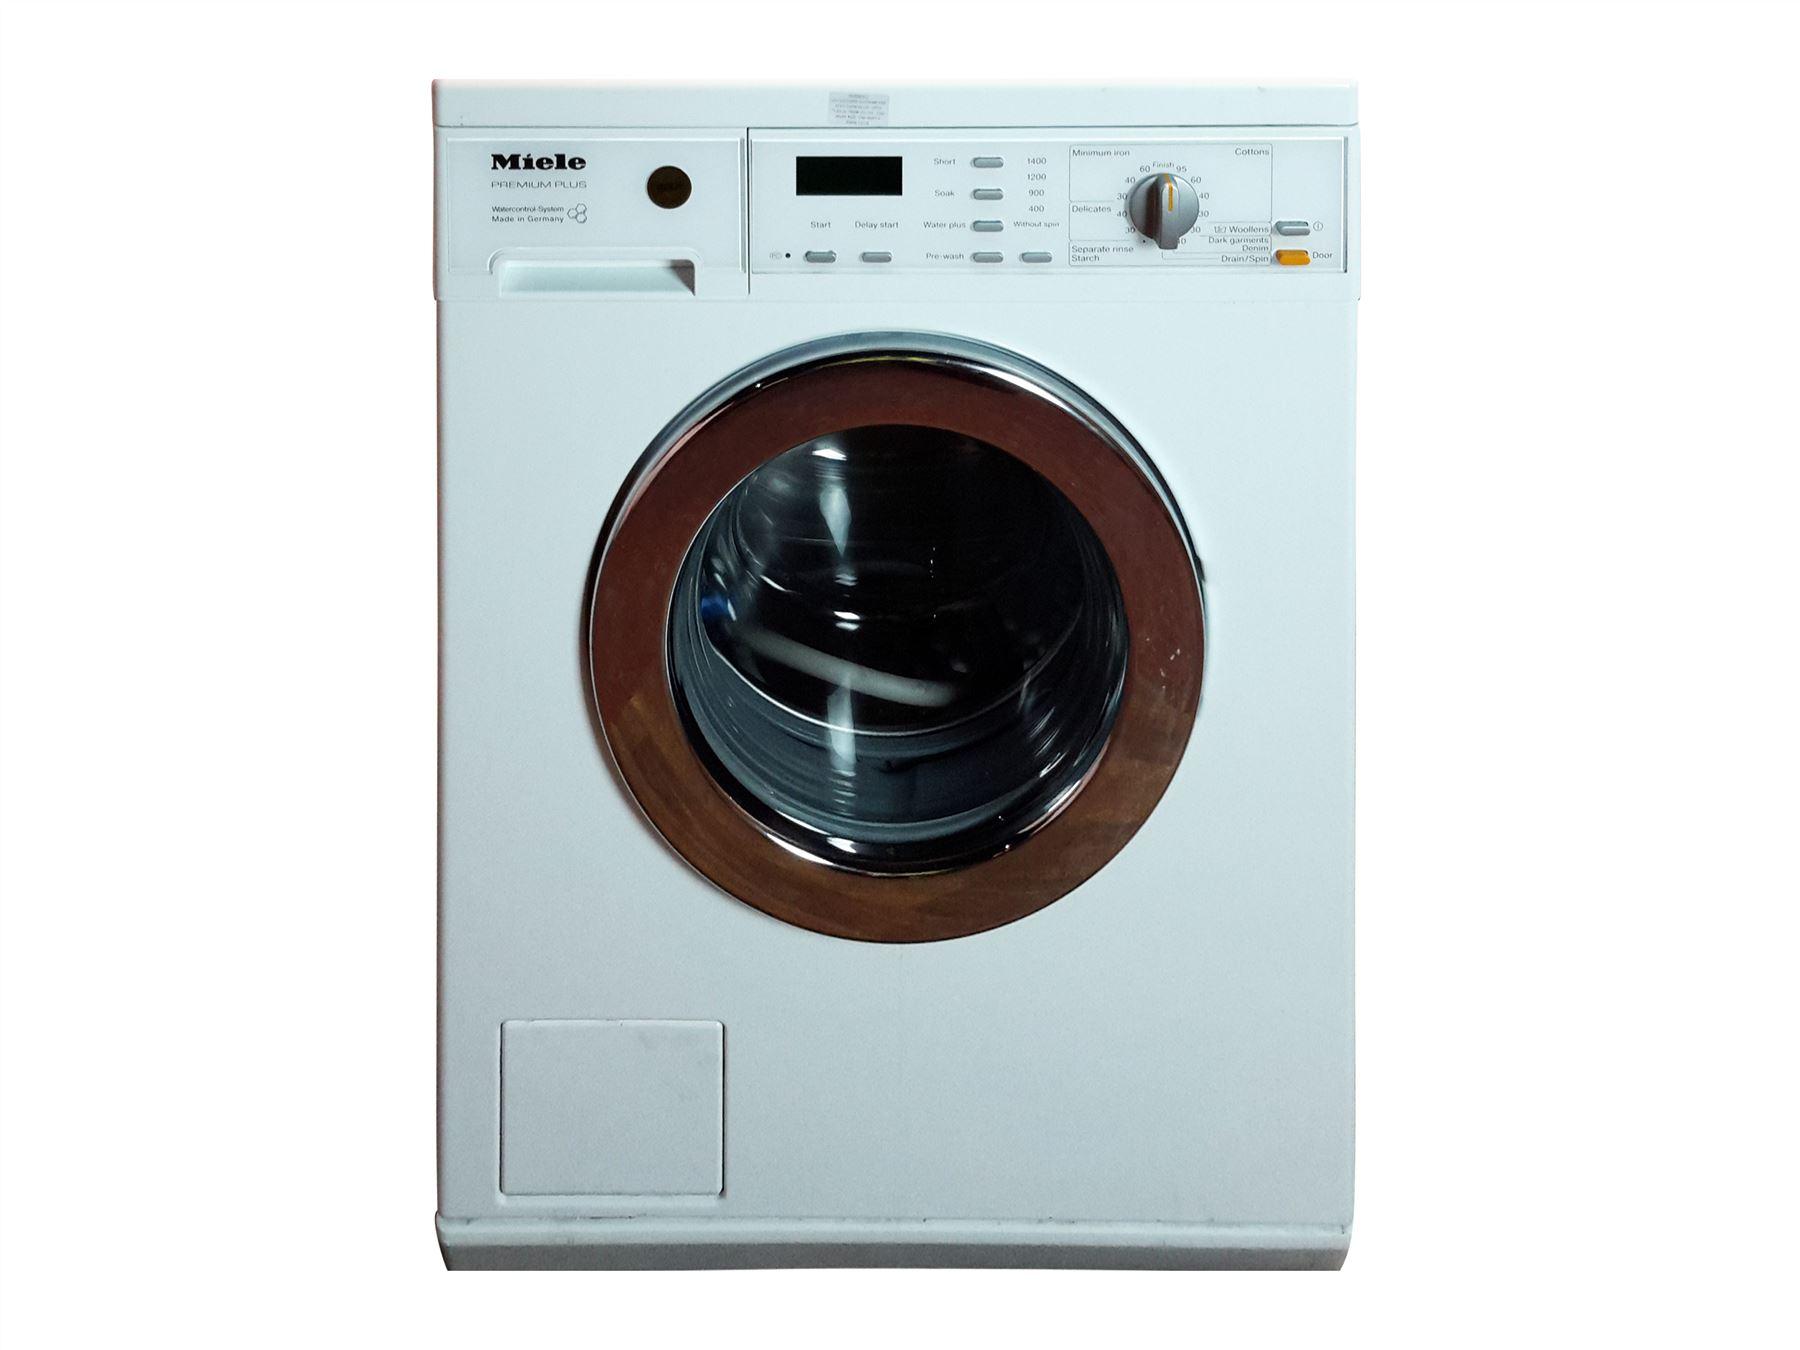 miele w5902 7kg washing machine white g 3211738. Black Bedroom Furniture Sets. Home Design Ideas